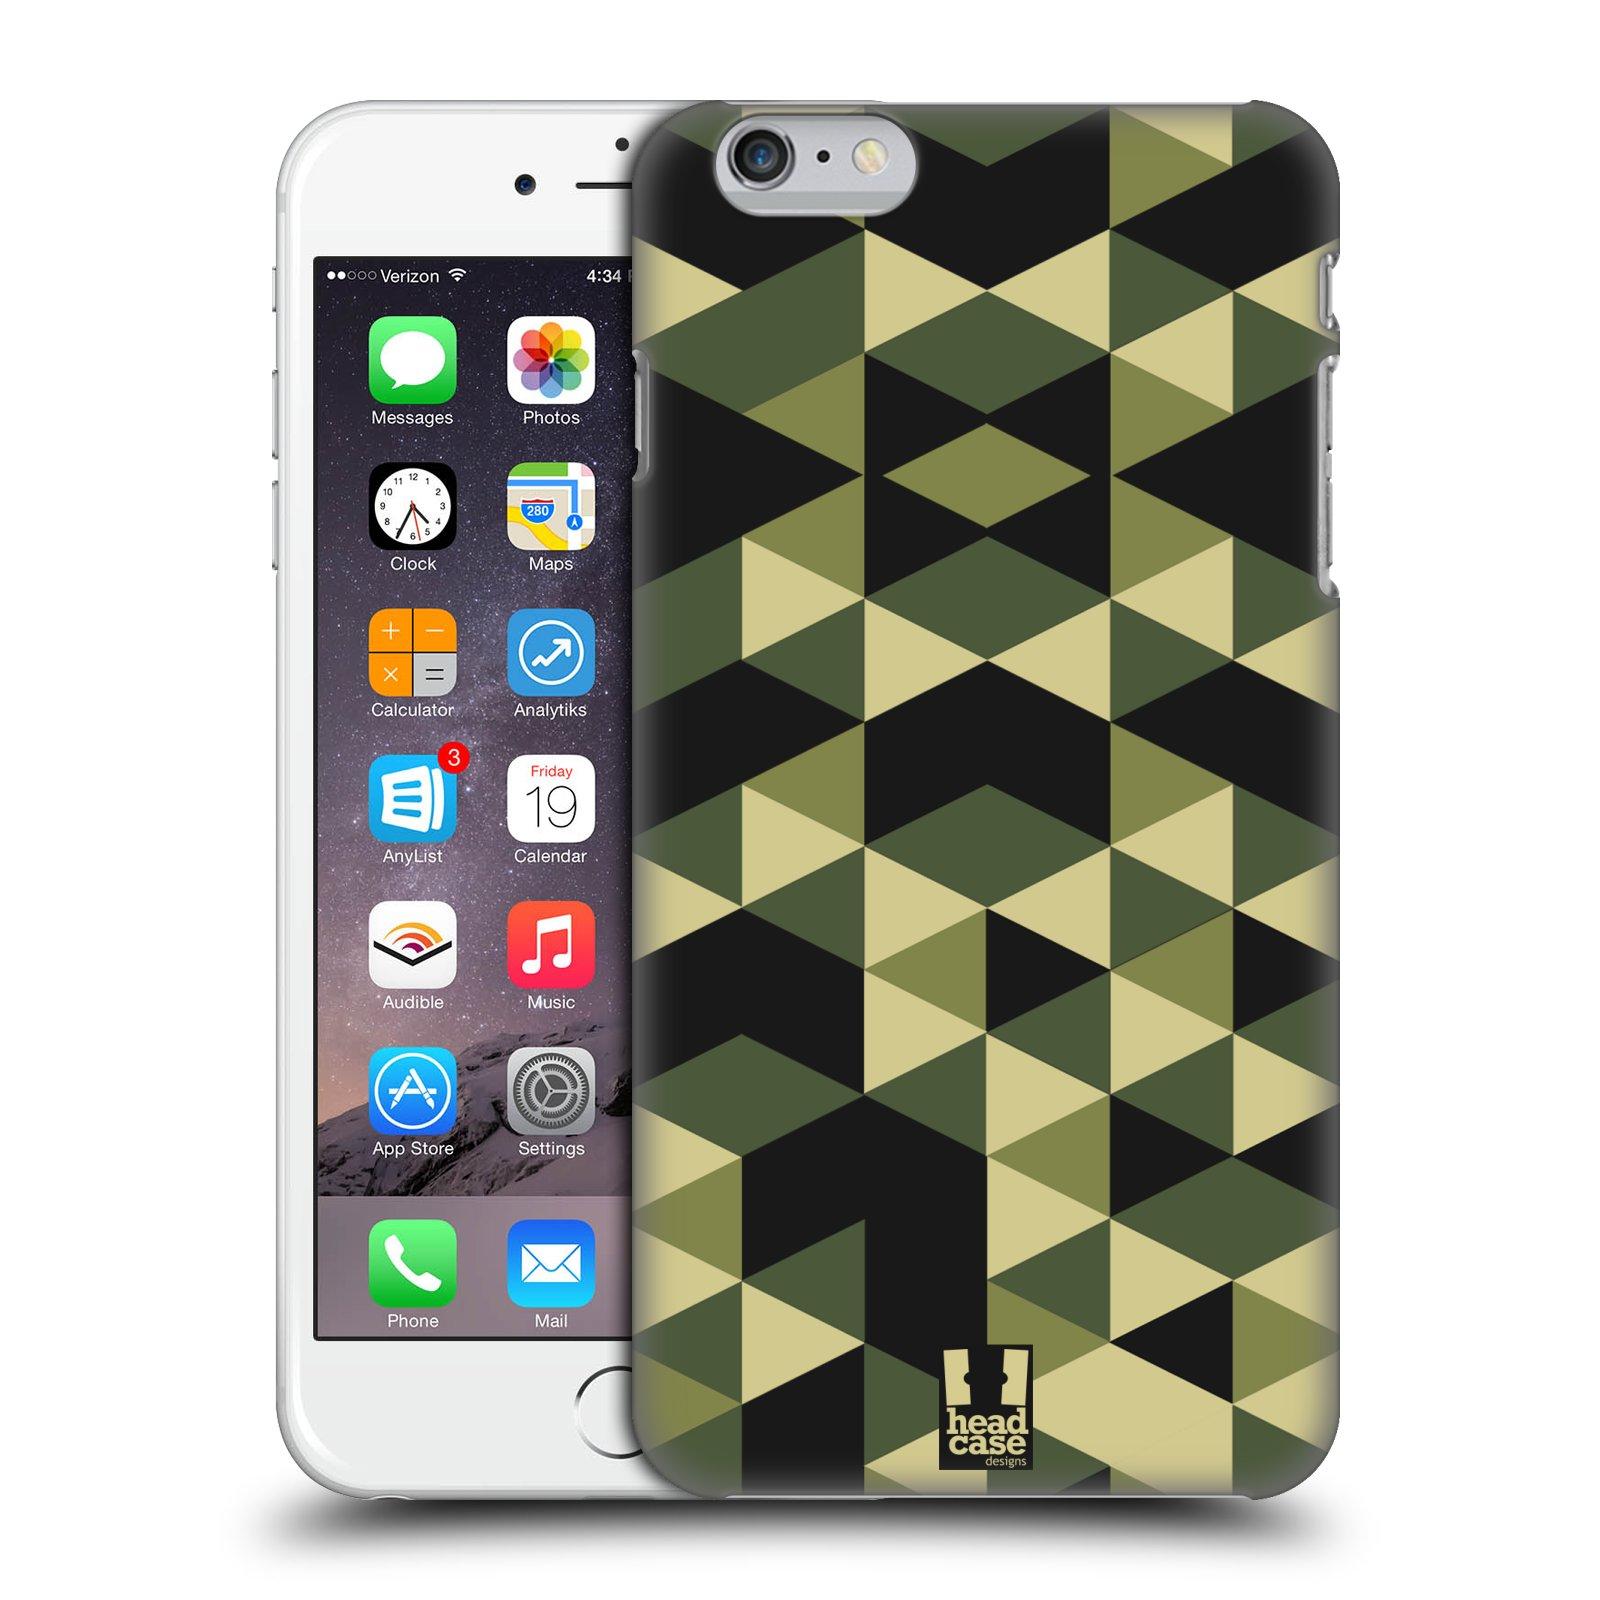 HEAD CASE DESIGNS GEOMETRIC CAMO CASE COVER FOR APPLE iPHONE 6 PLUS 5.5